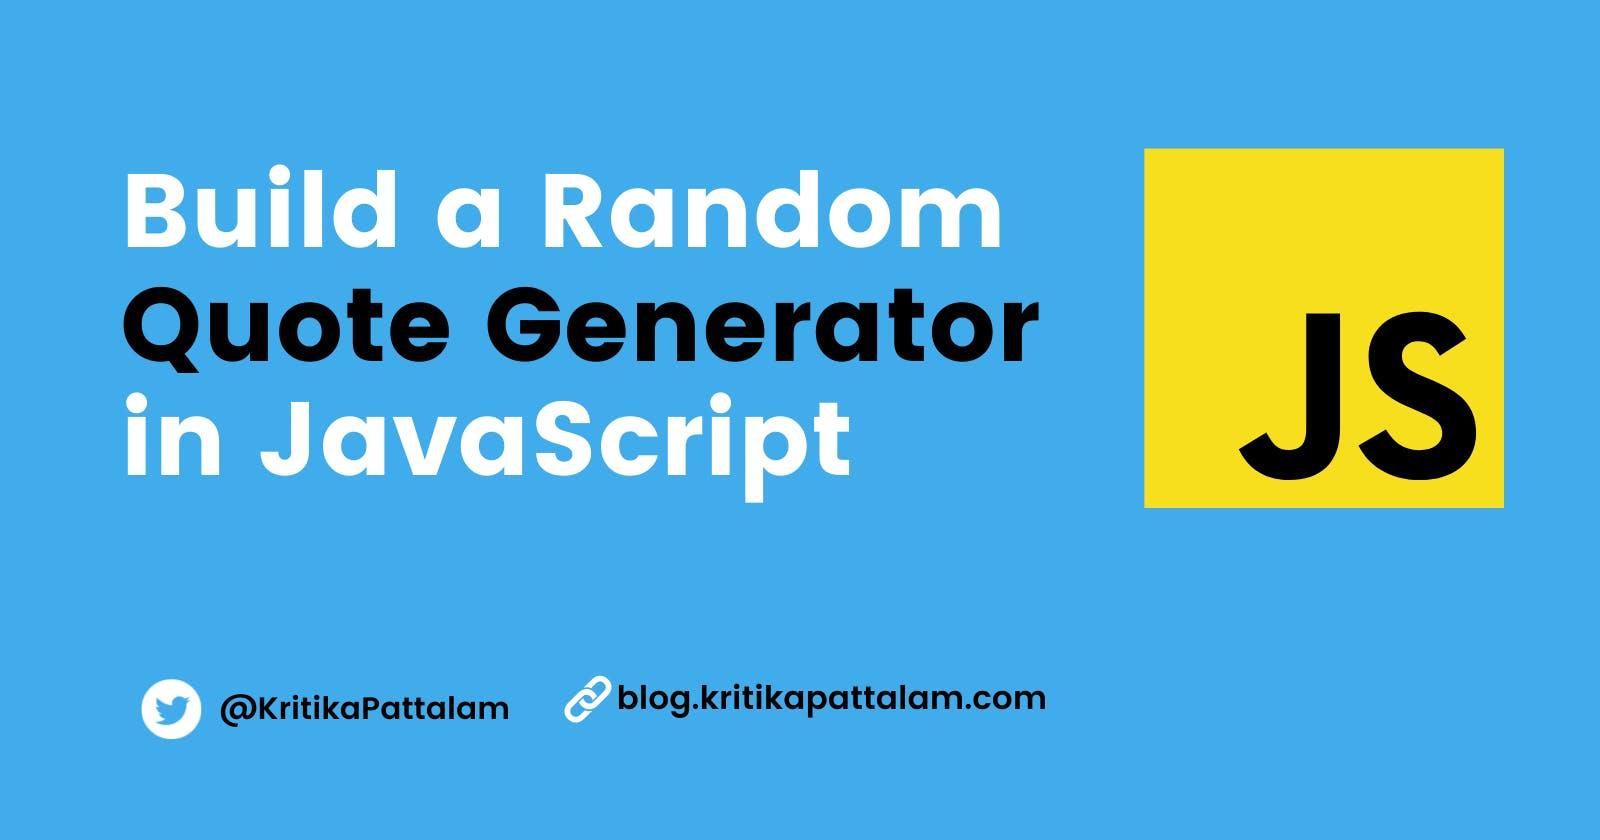 Build a Random Quote Generator using JavaScript